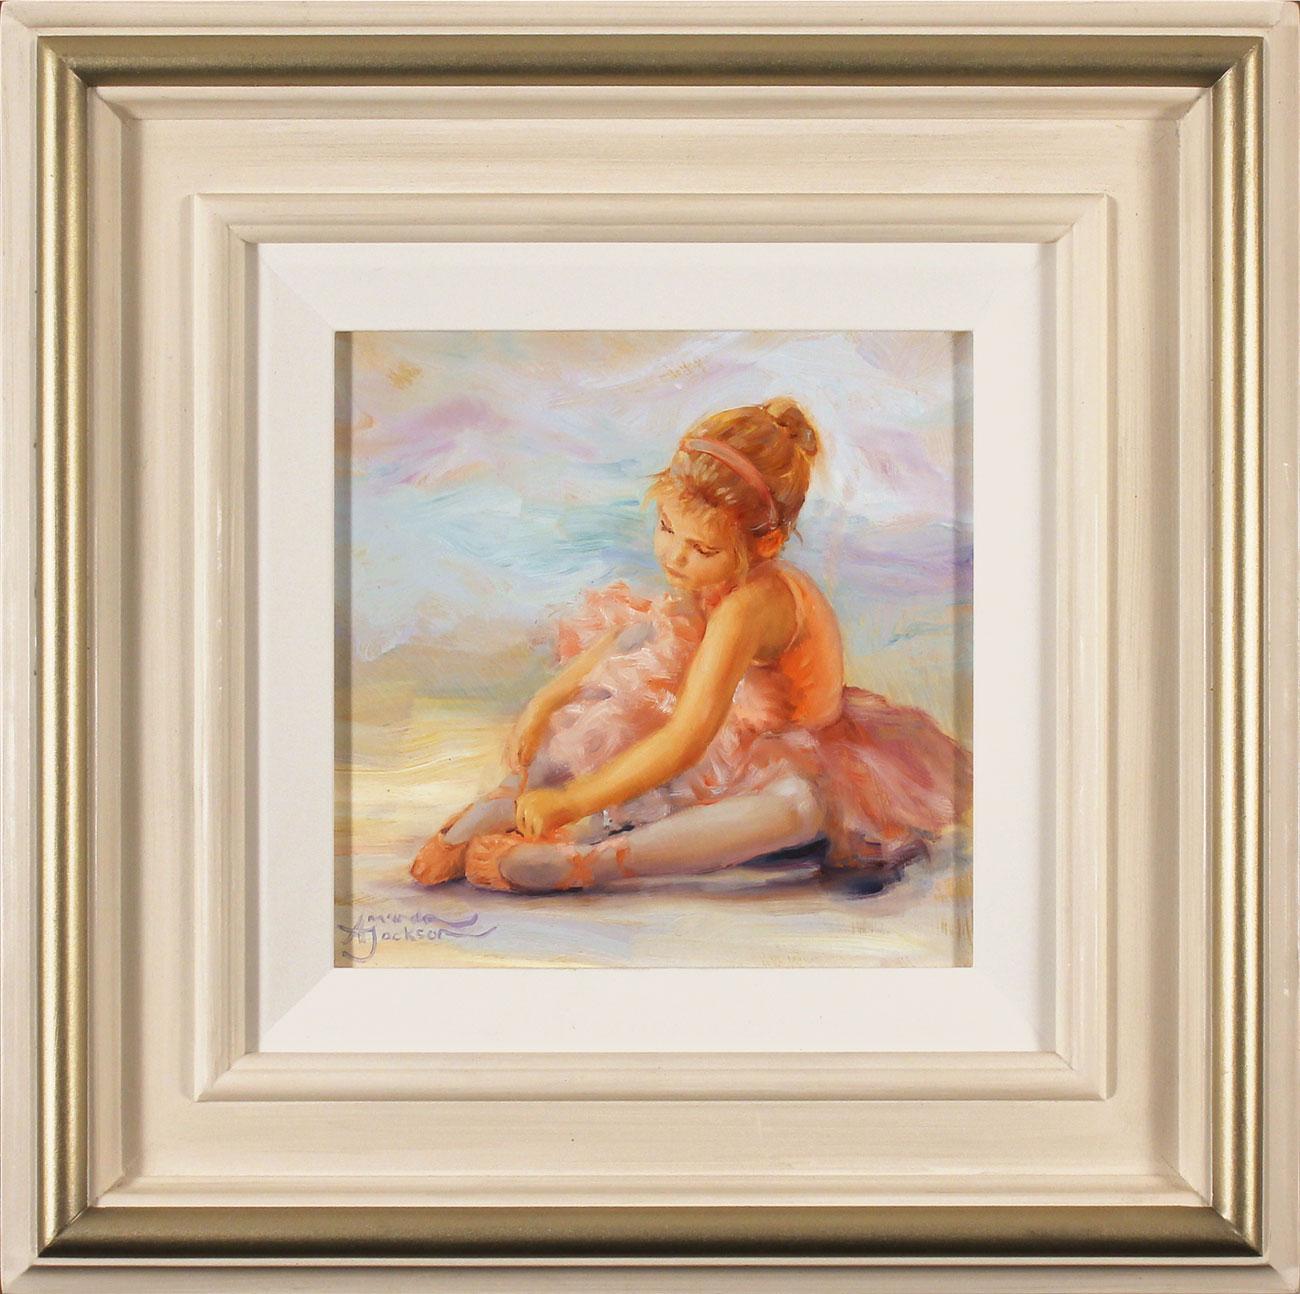 Amanda Jackson, Original oil painting on panel, Tying Ribbons, click to enlarge